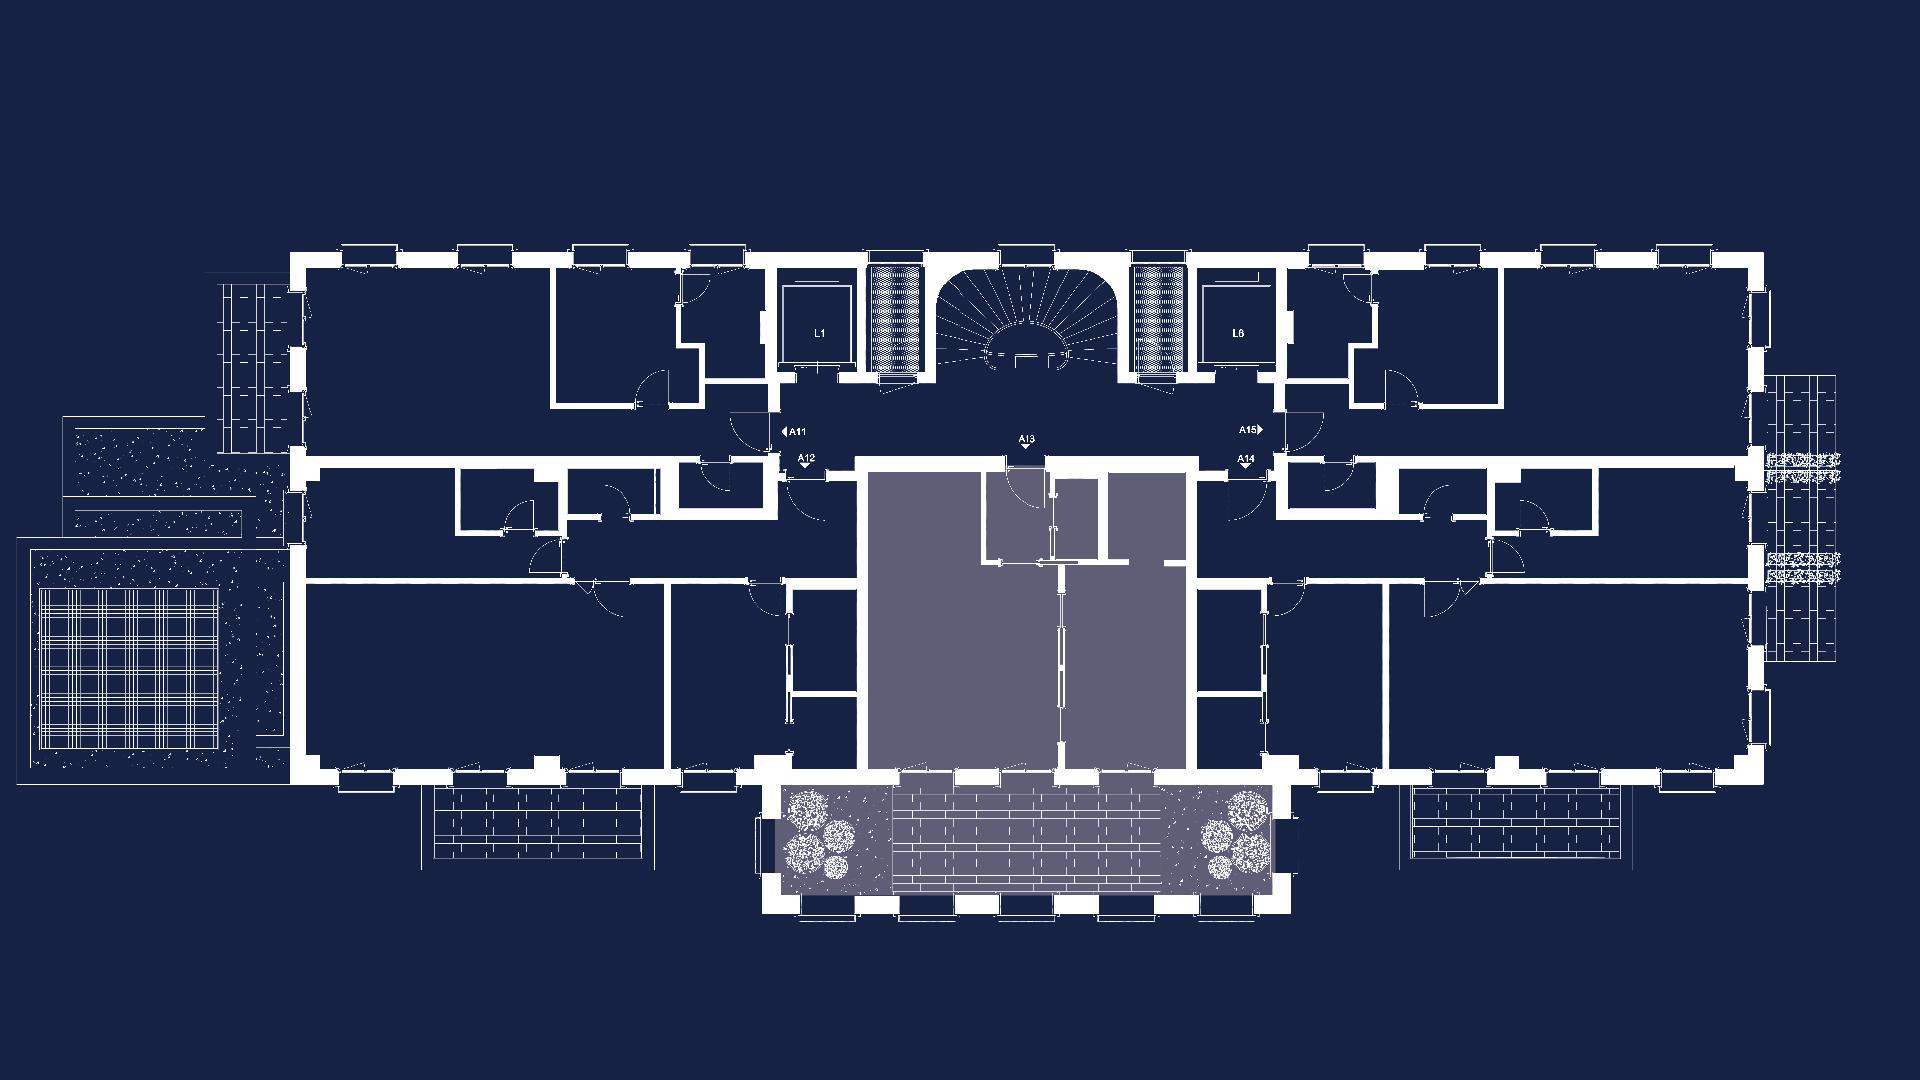 https://generalinvest.me/upl/2020/08/A13_mapa.jpg